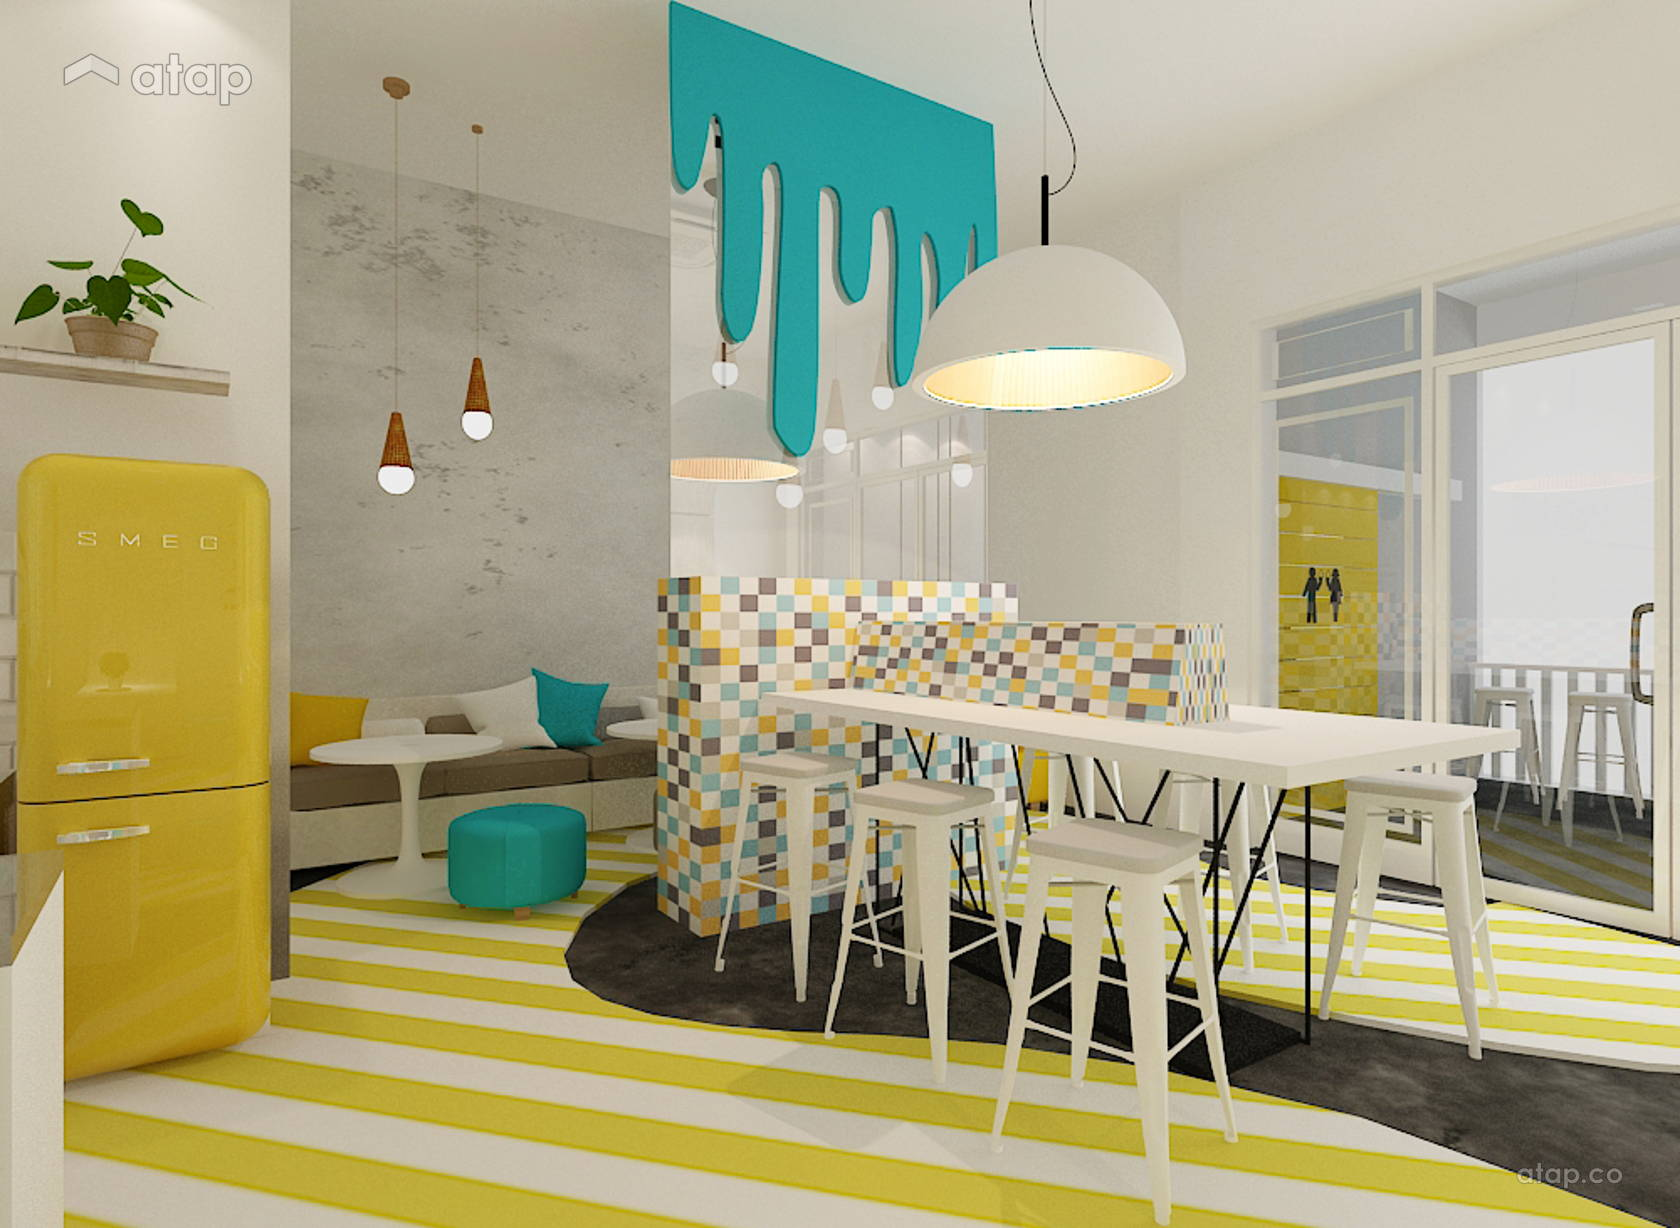 Aebout Ice Cream Shop Interior Design Renovation Ideas Photos And